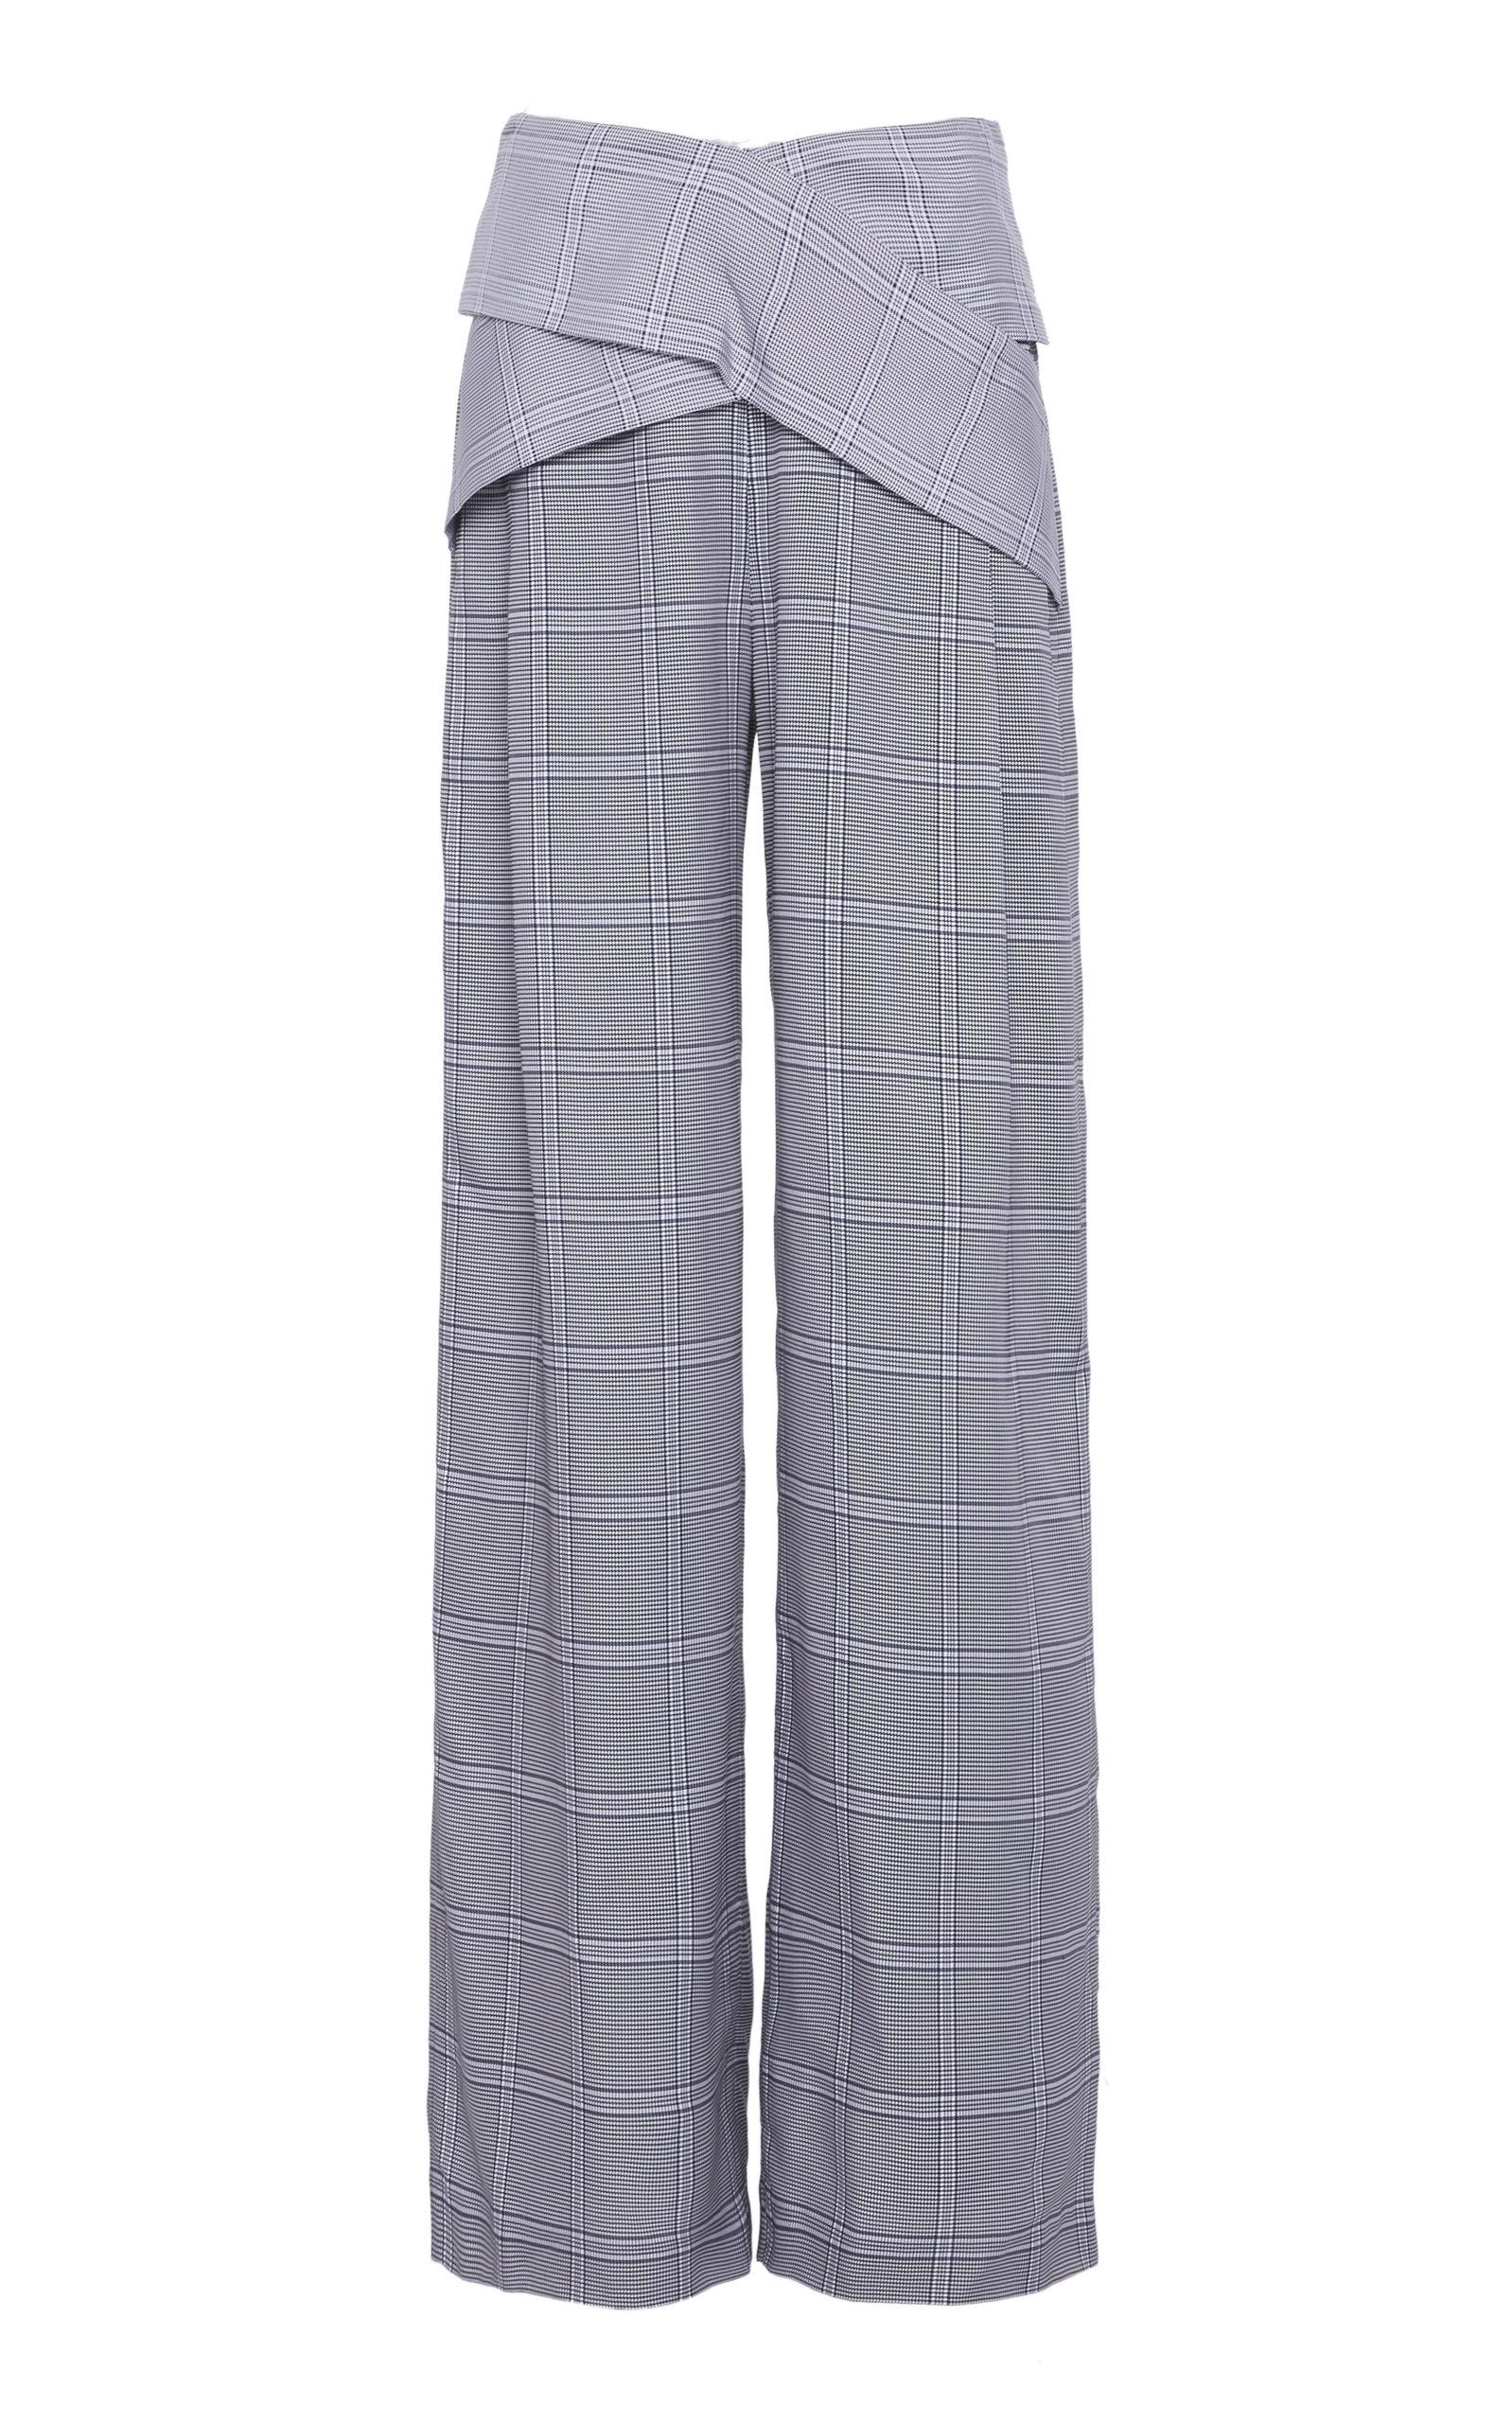 DION LEE WIDE-LEG CHECK PANTS